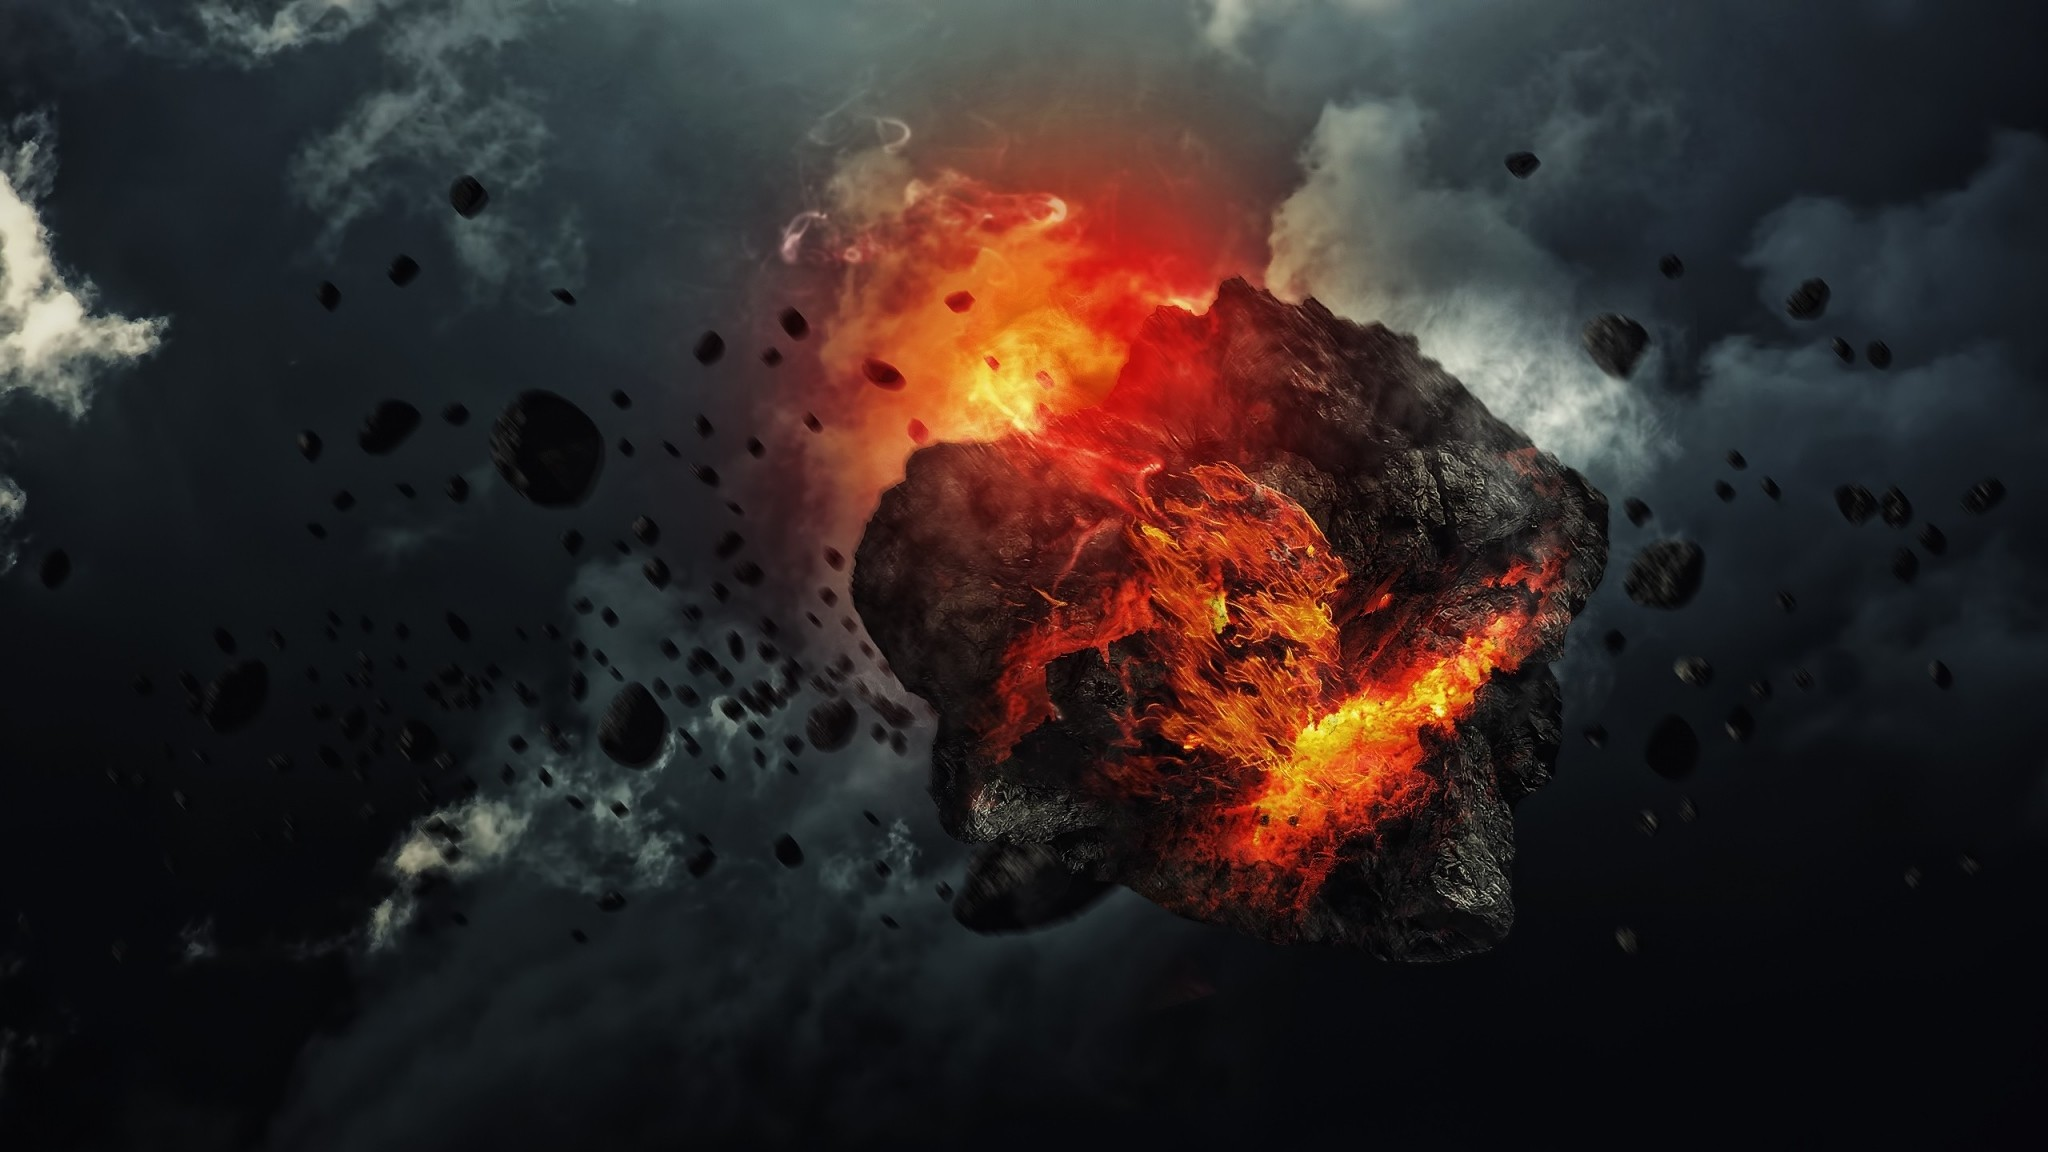 Wallpaper sky, clouds, dark, explosion, fire